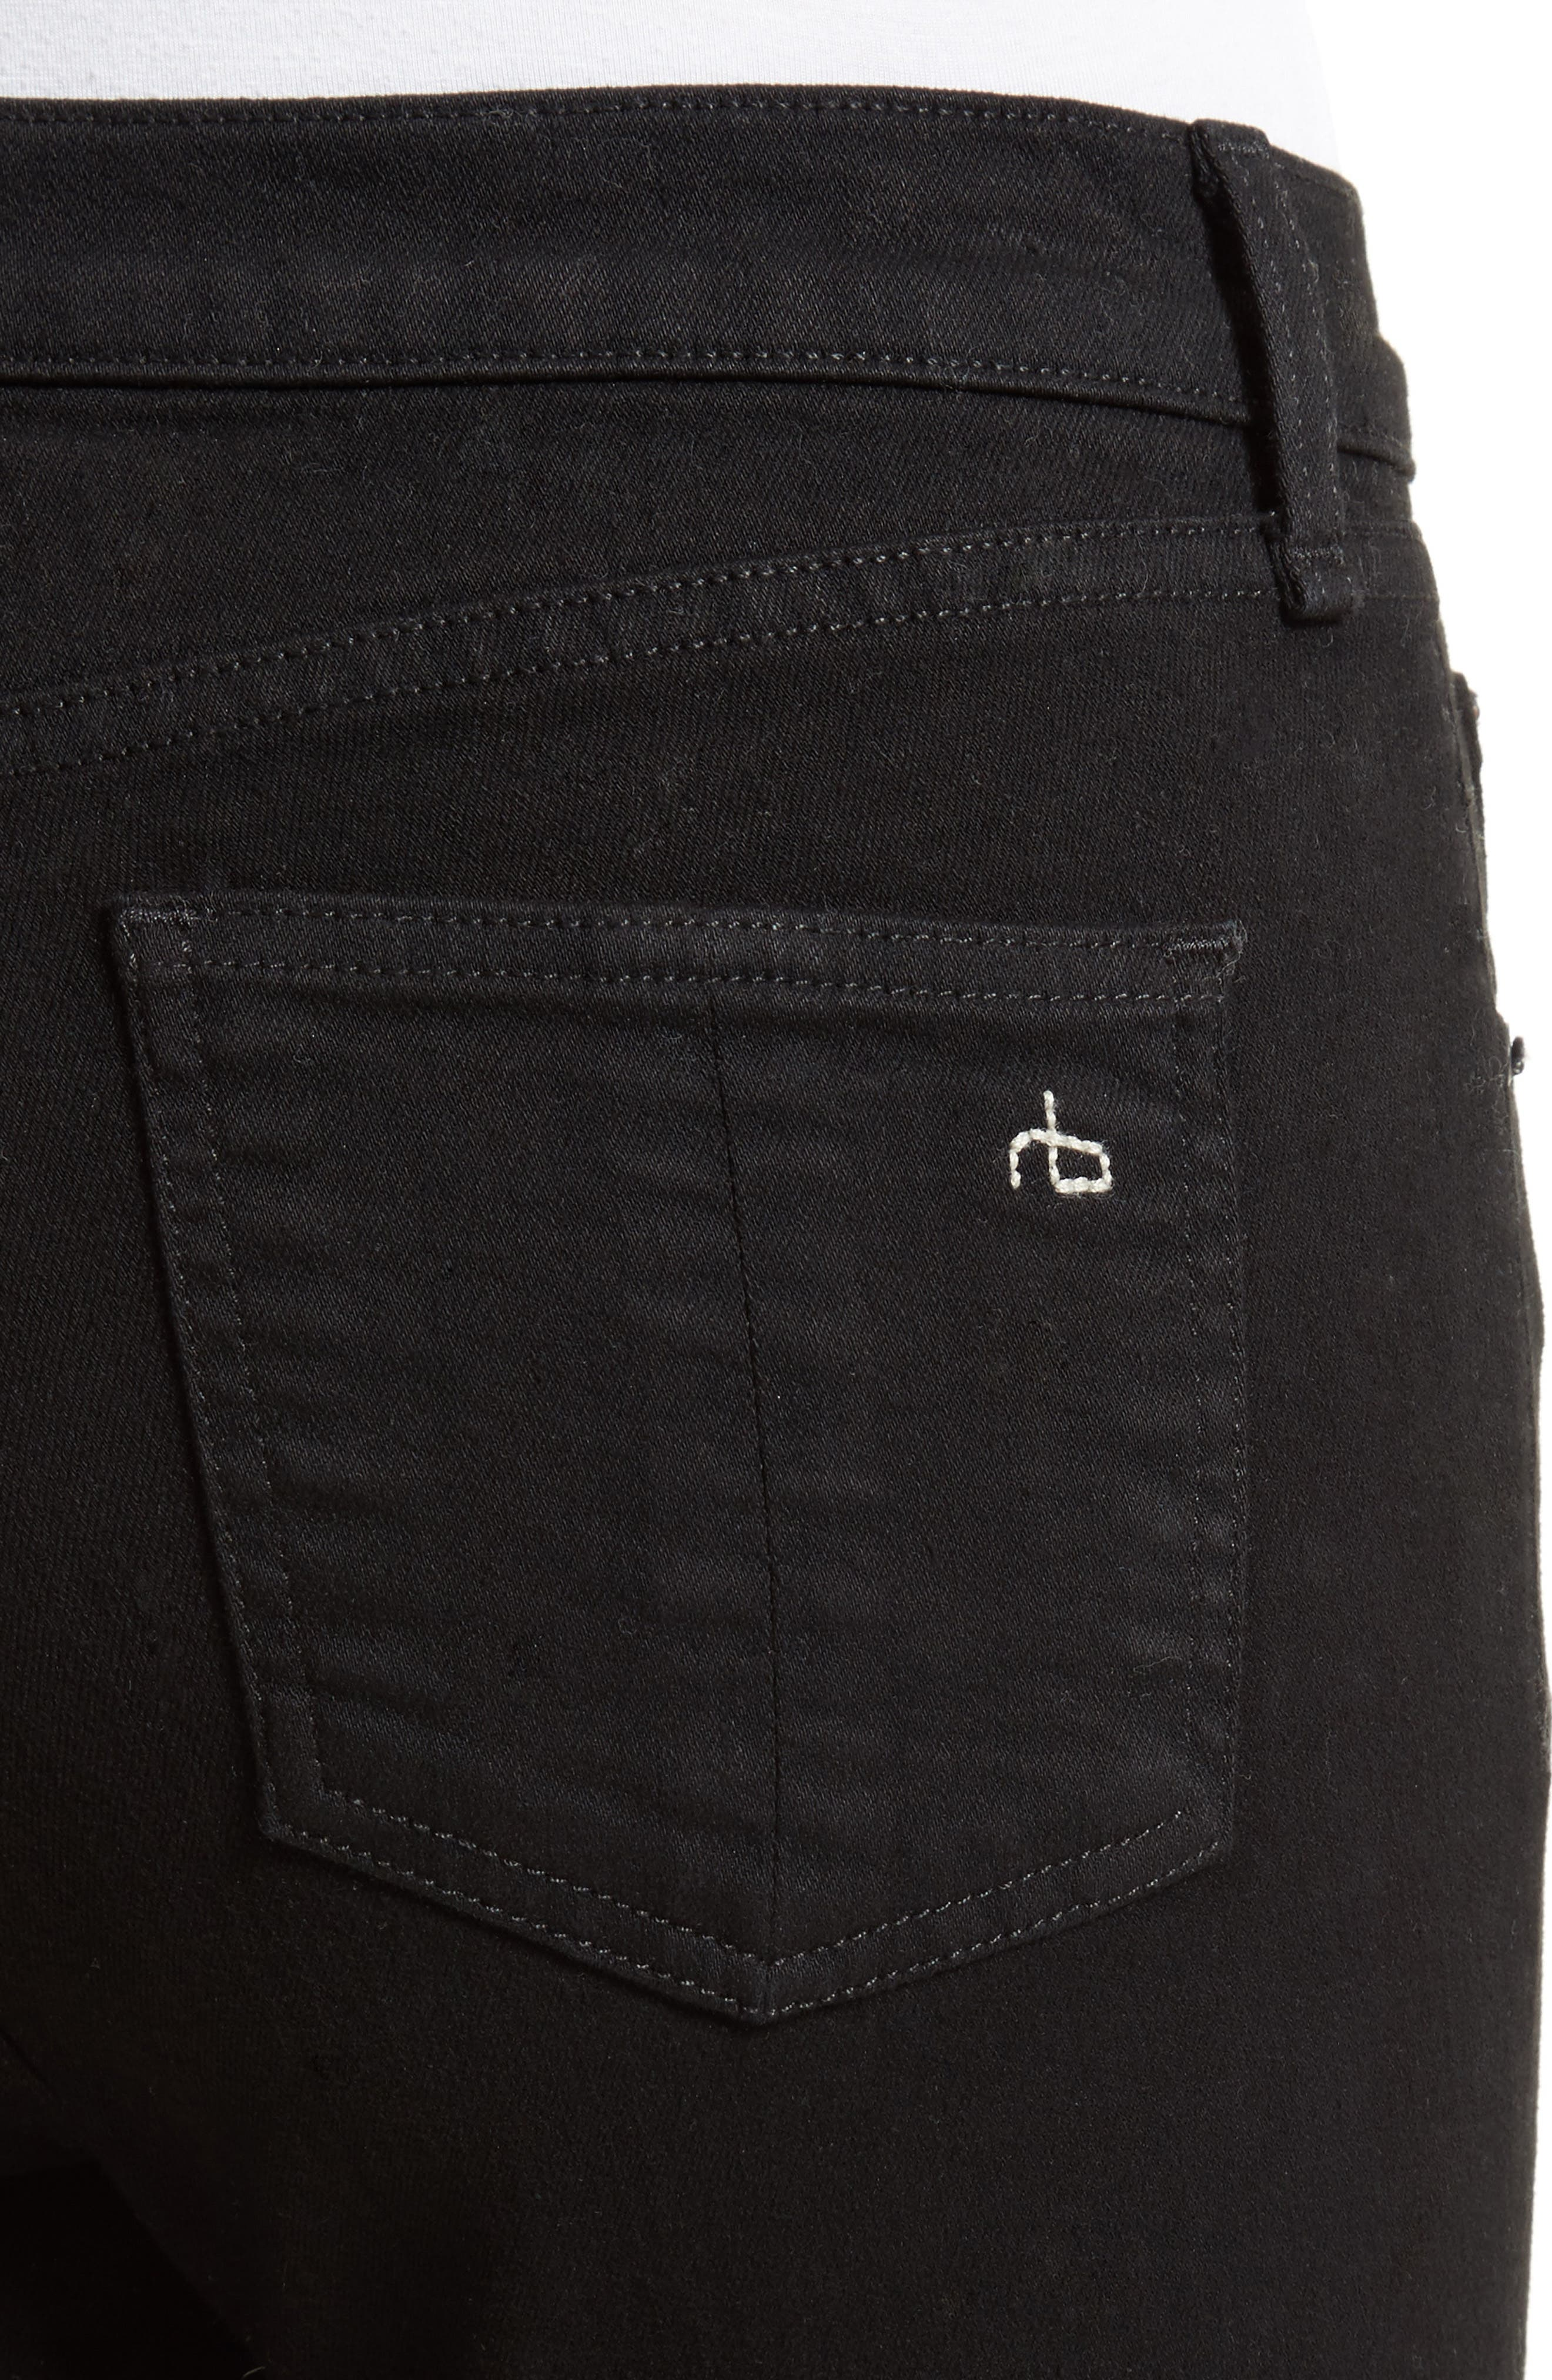 Cutoff Capri Jeans,                             Alternate thumbnail 4, color,                             001